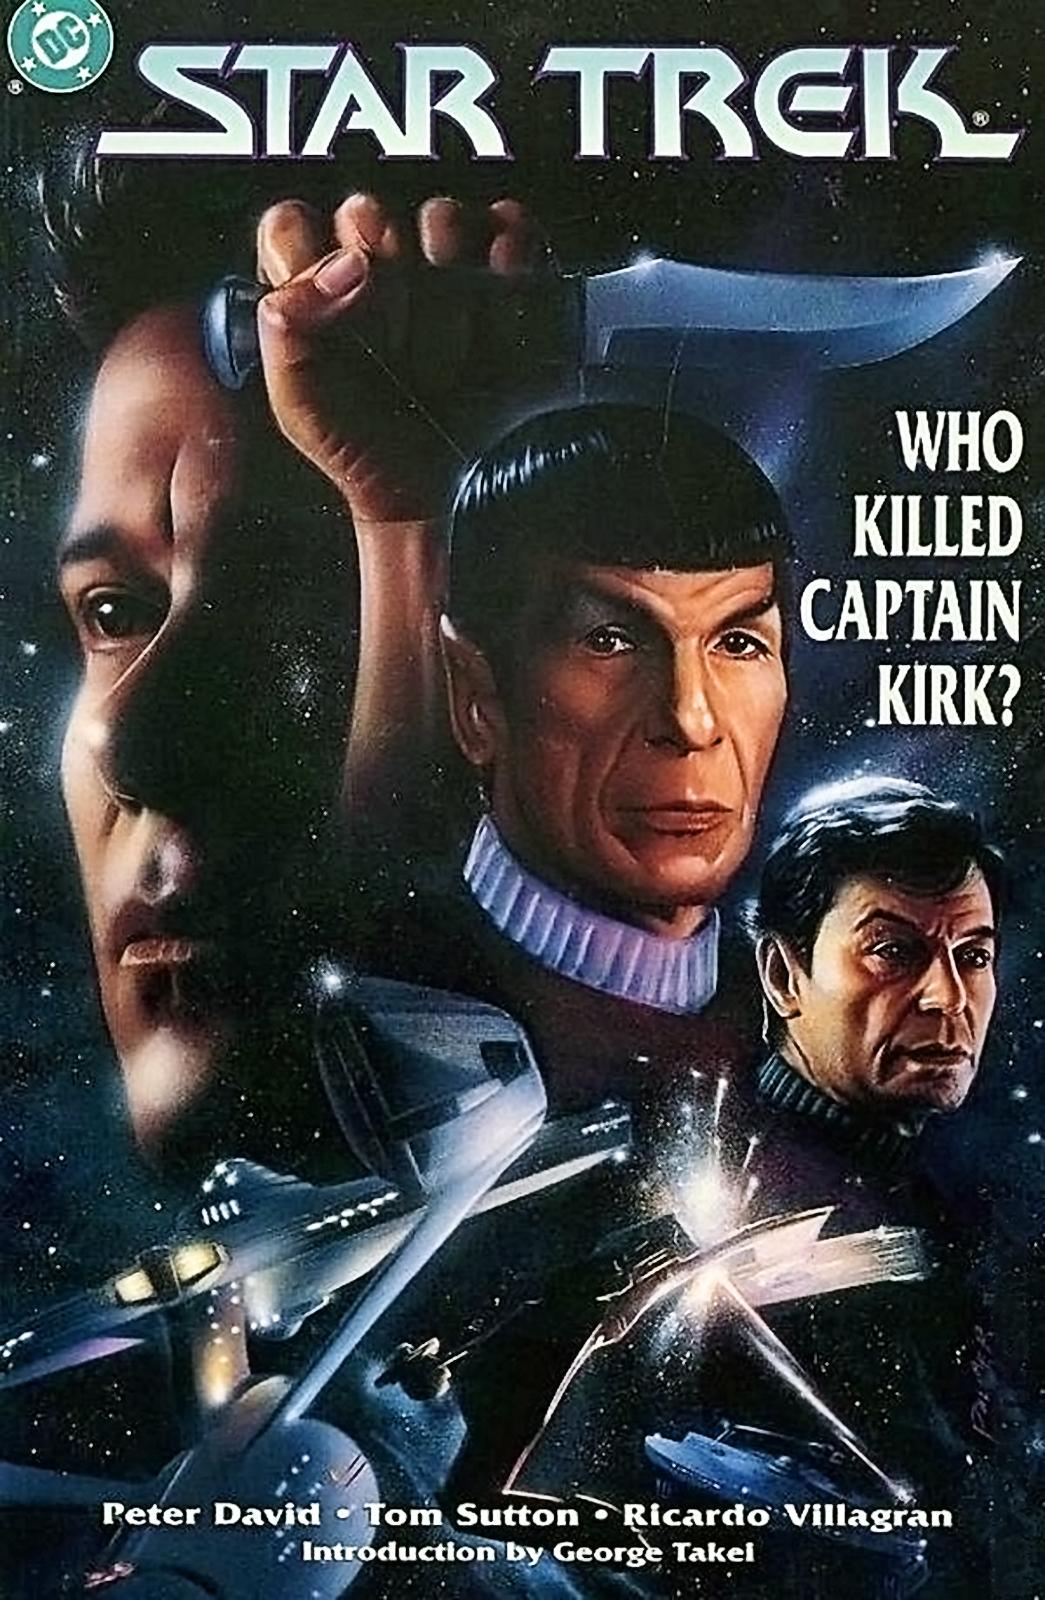 Who Killed Captain Kirk?